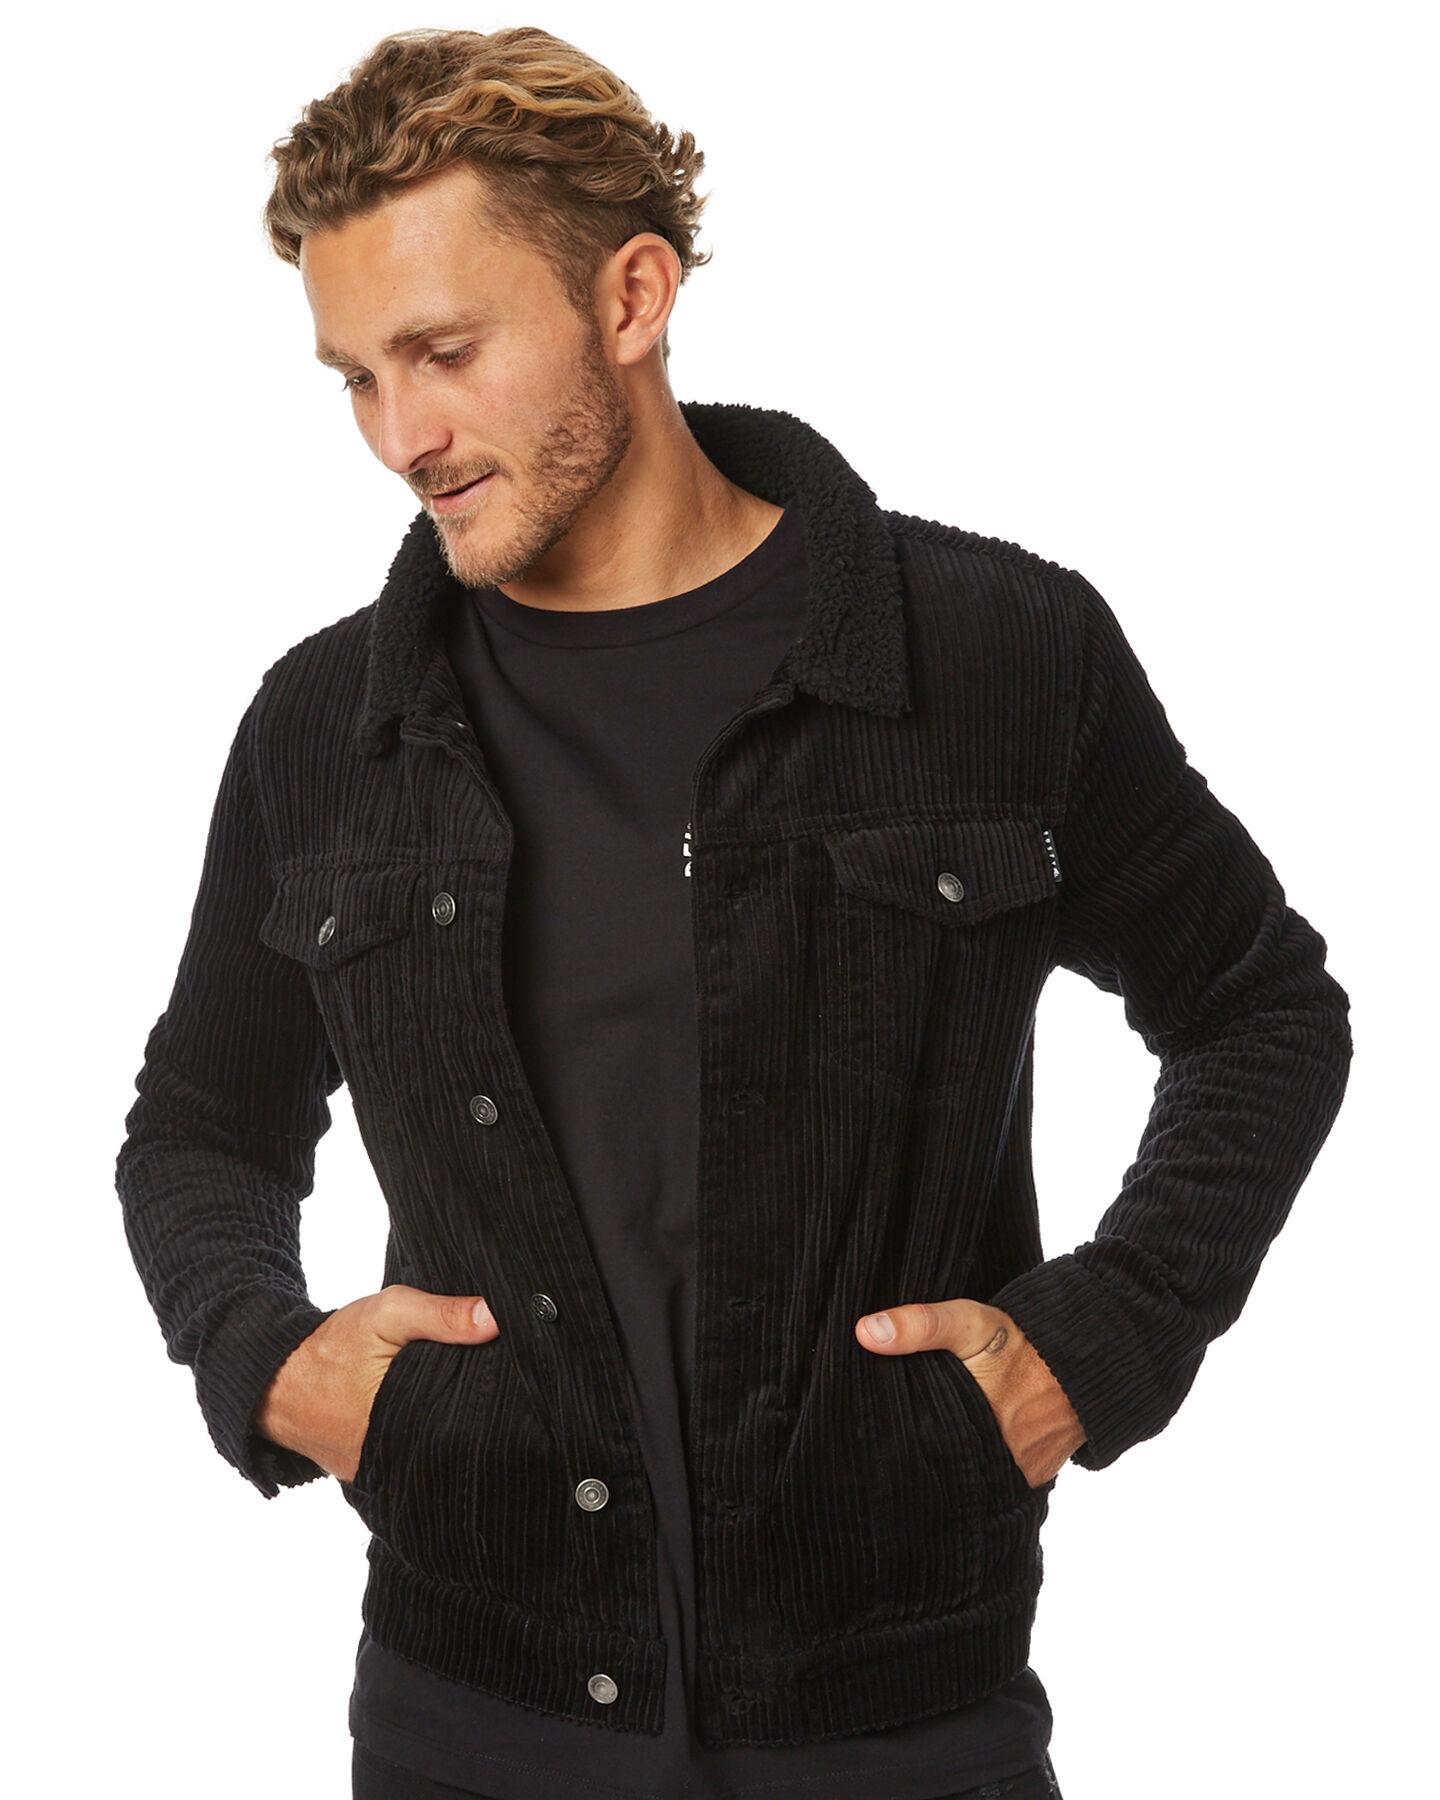 Burgundy cord jacket for sale